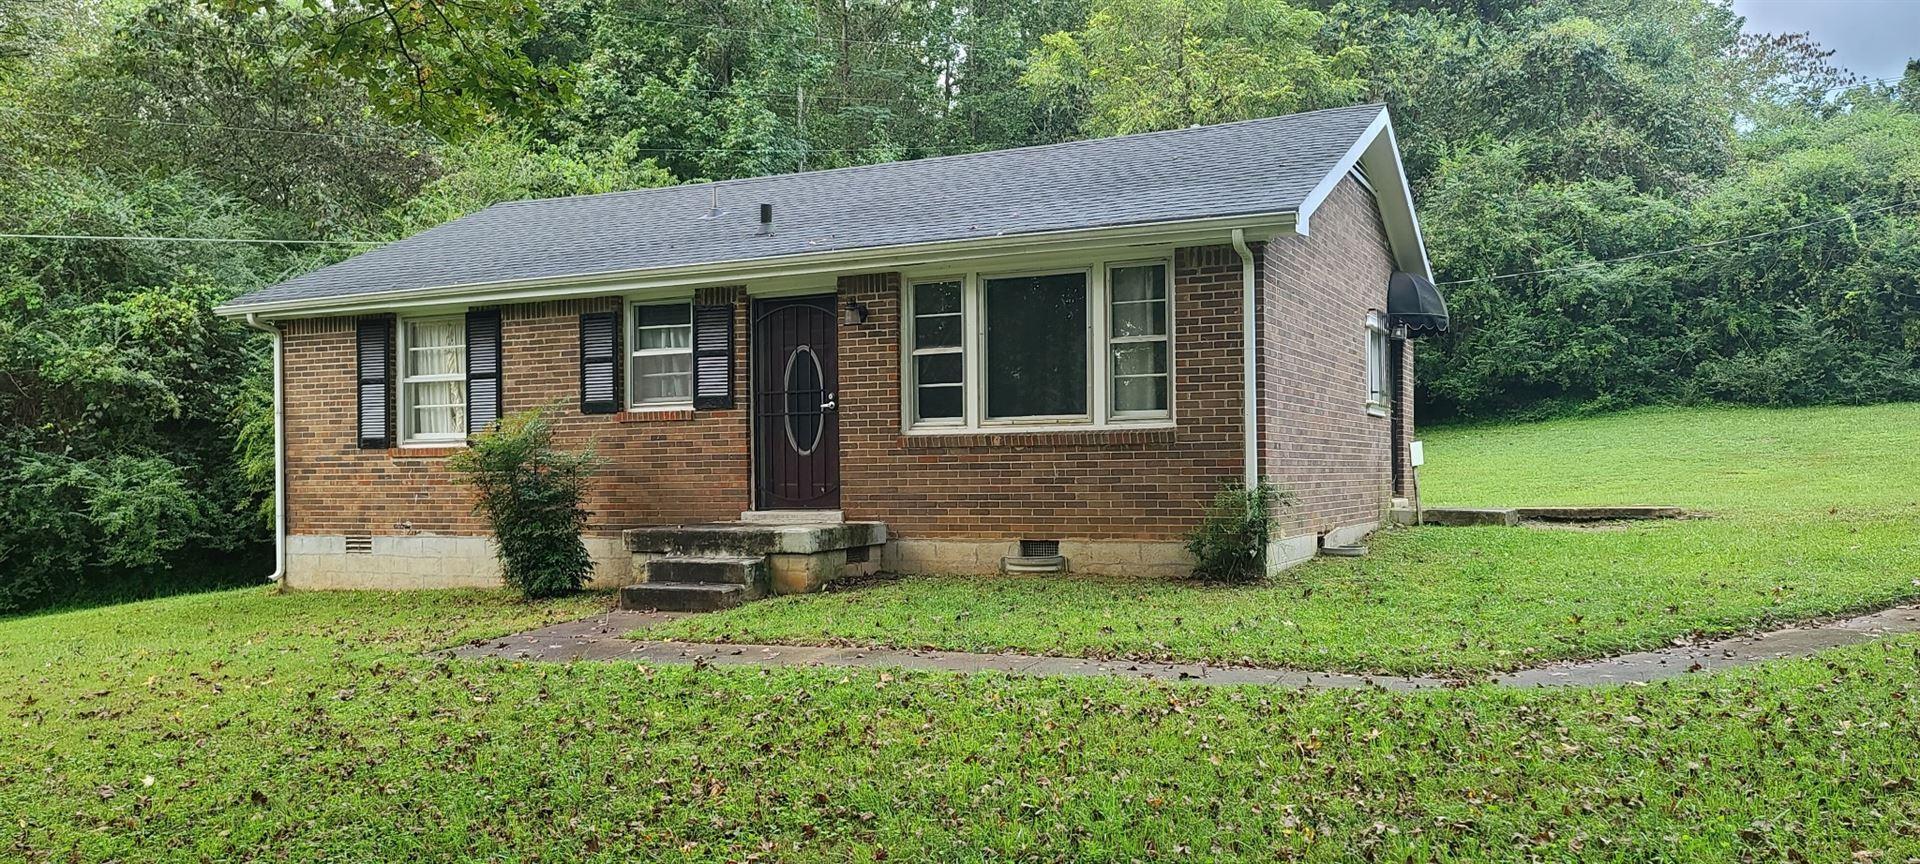 Photo of 208 Scarlet Dr, Clarksville, TN 37040 (MLS # 2292279)